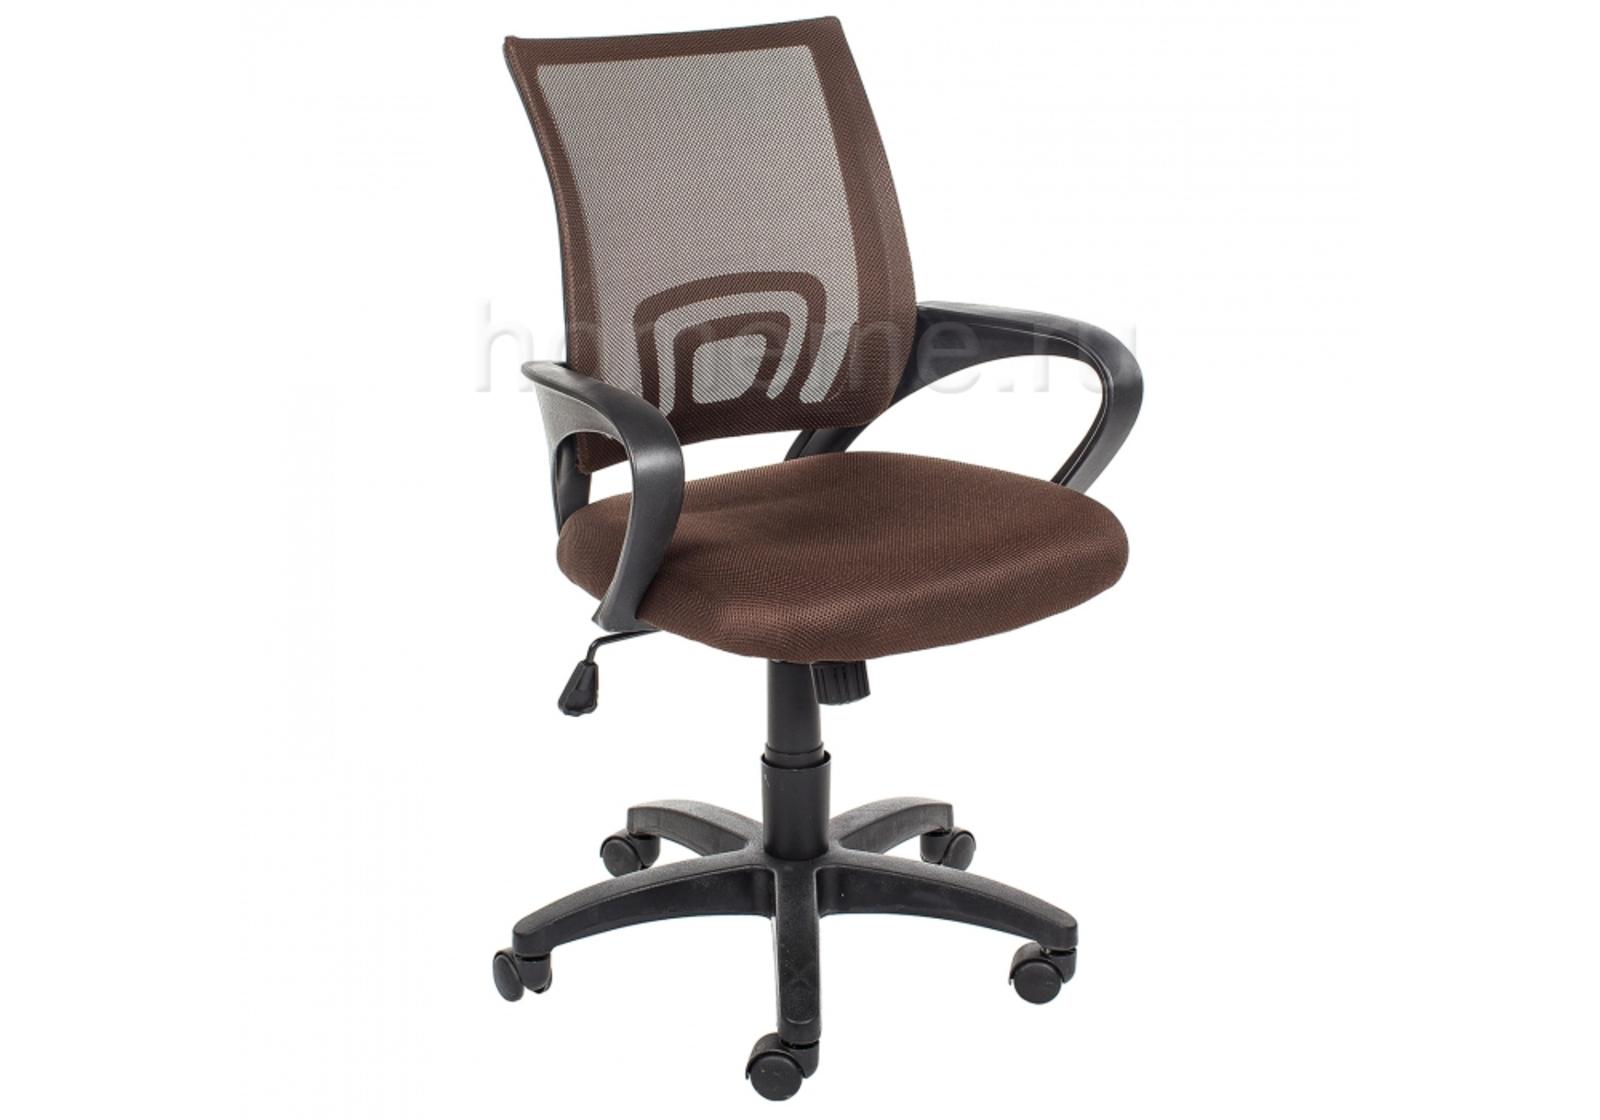 Кресло для офиса HomeMe Turin коричневое 1479 от Homeme.ru